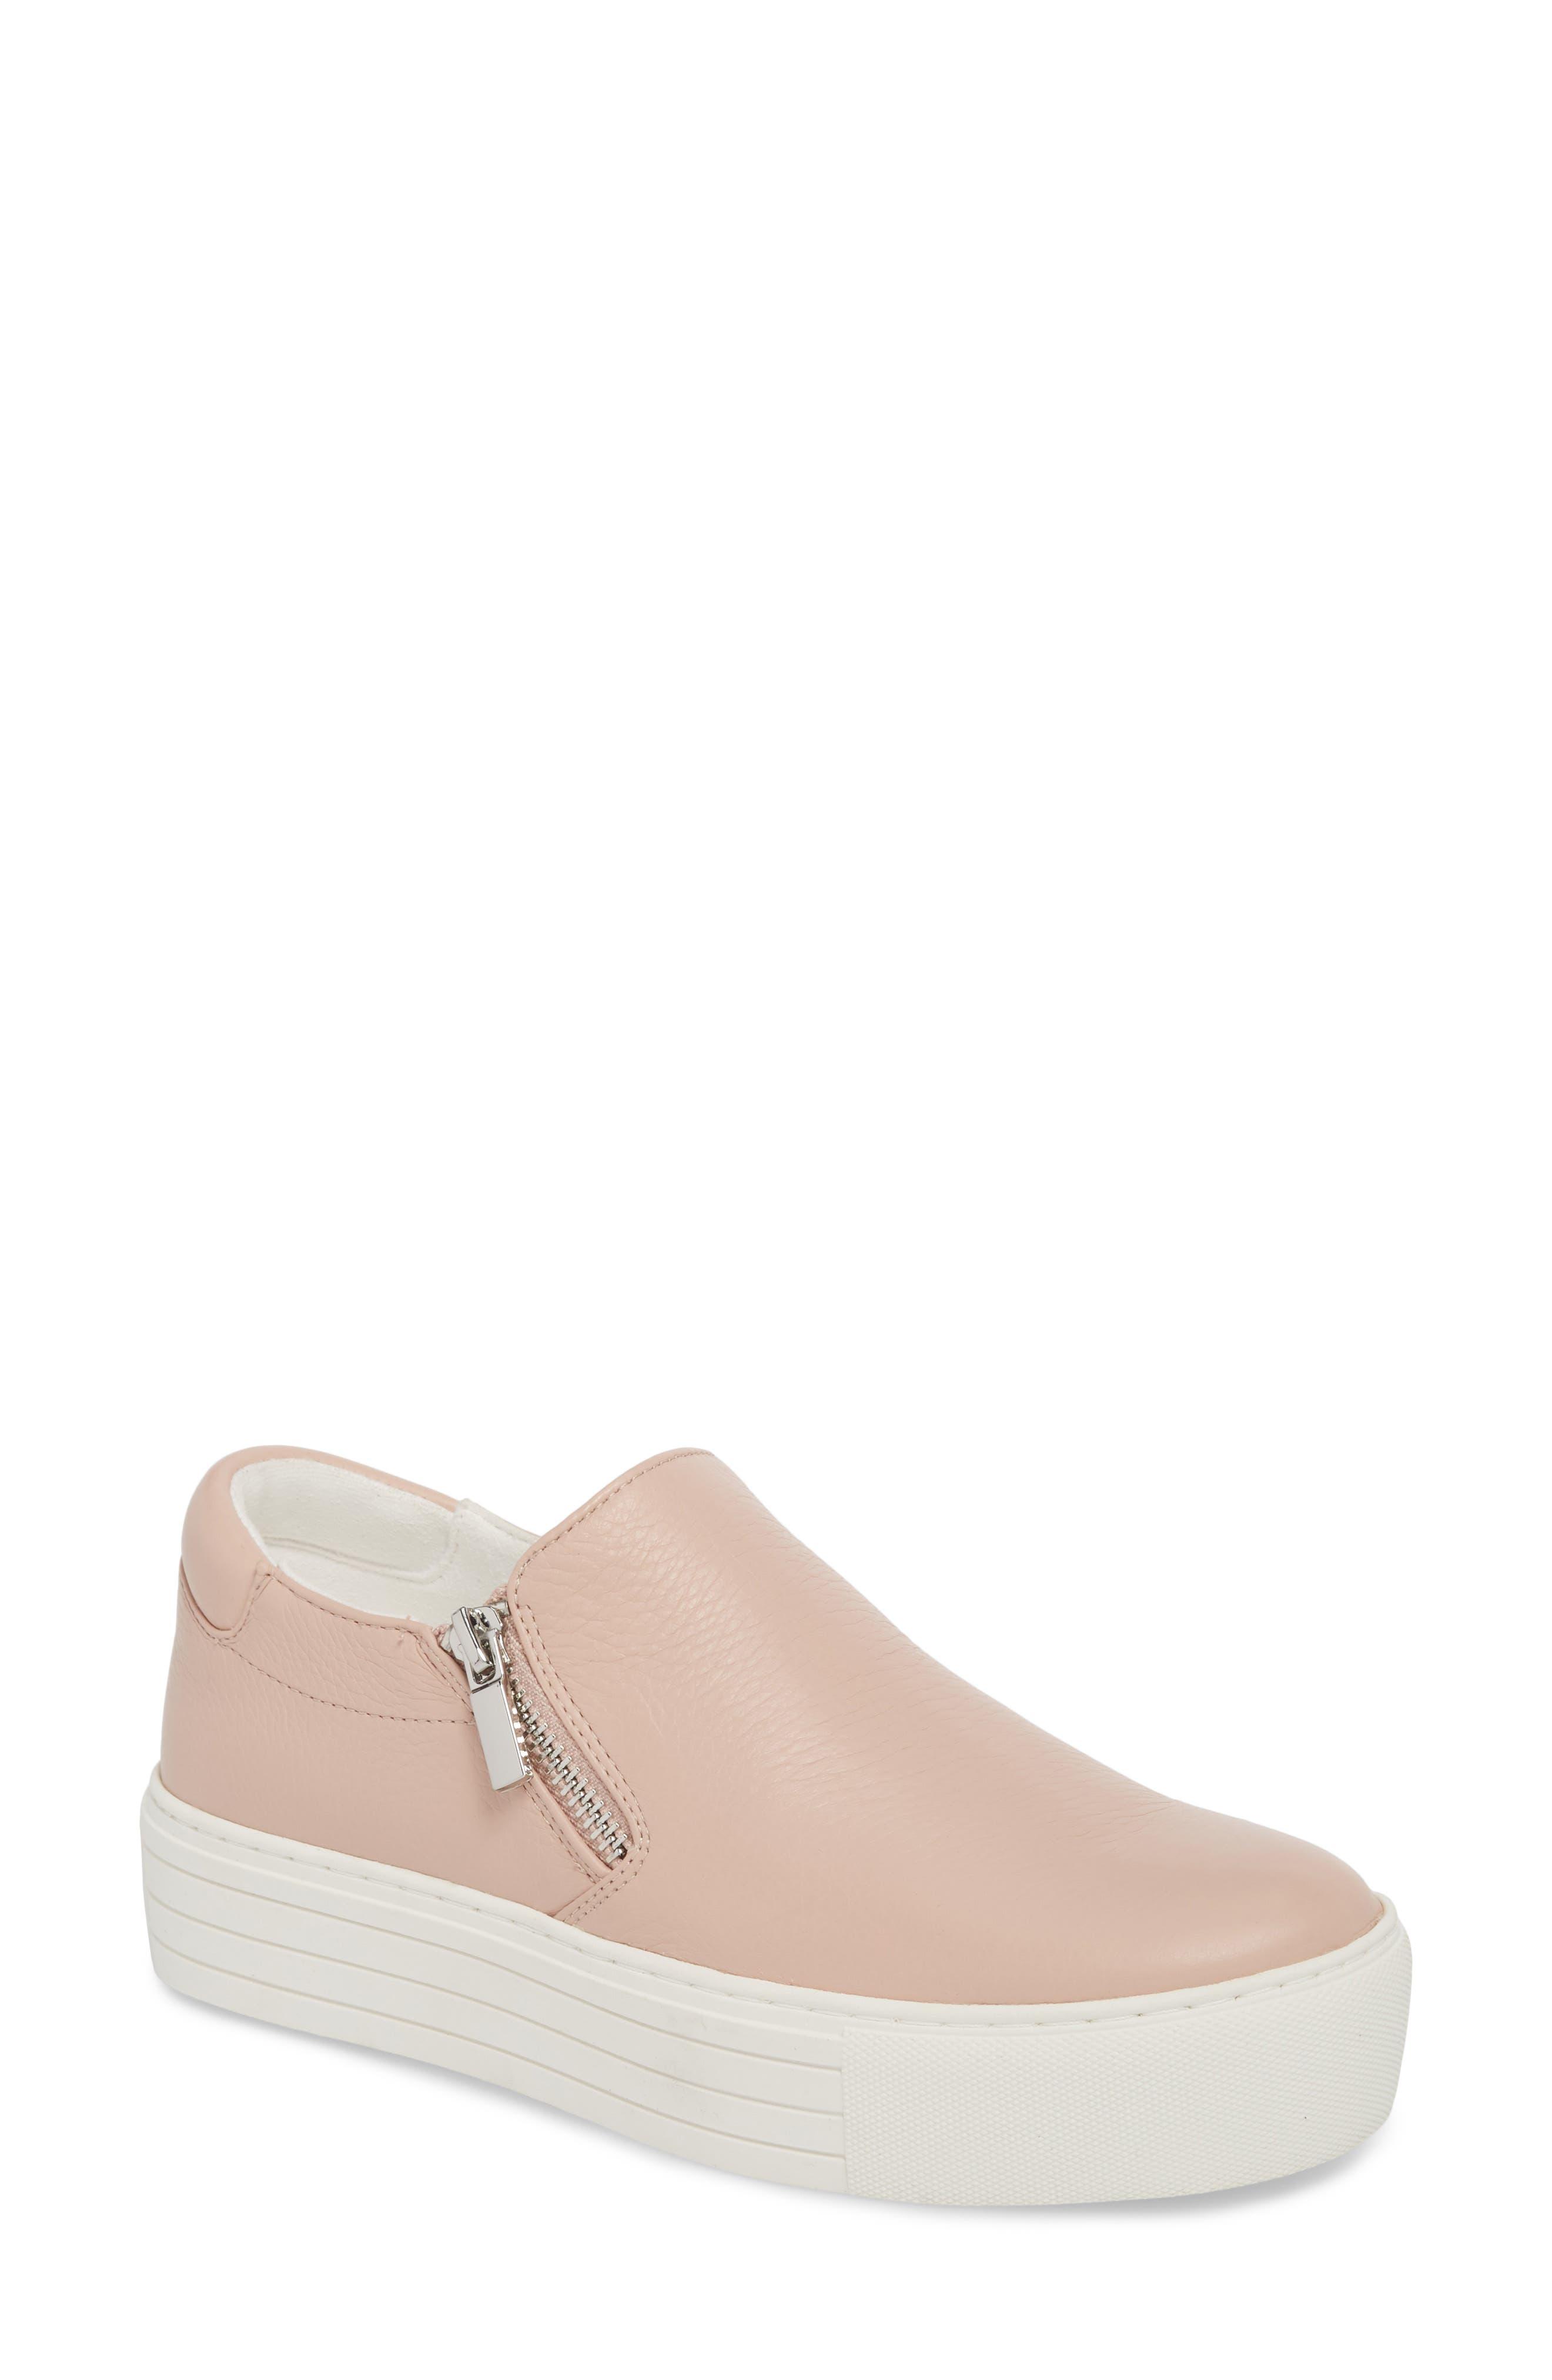 Kenneth Cole New York Juneau Platform Slip-On Sneaker (Women)